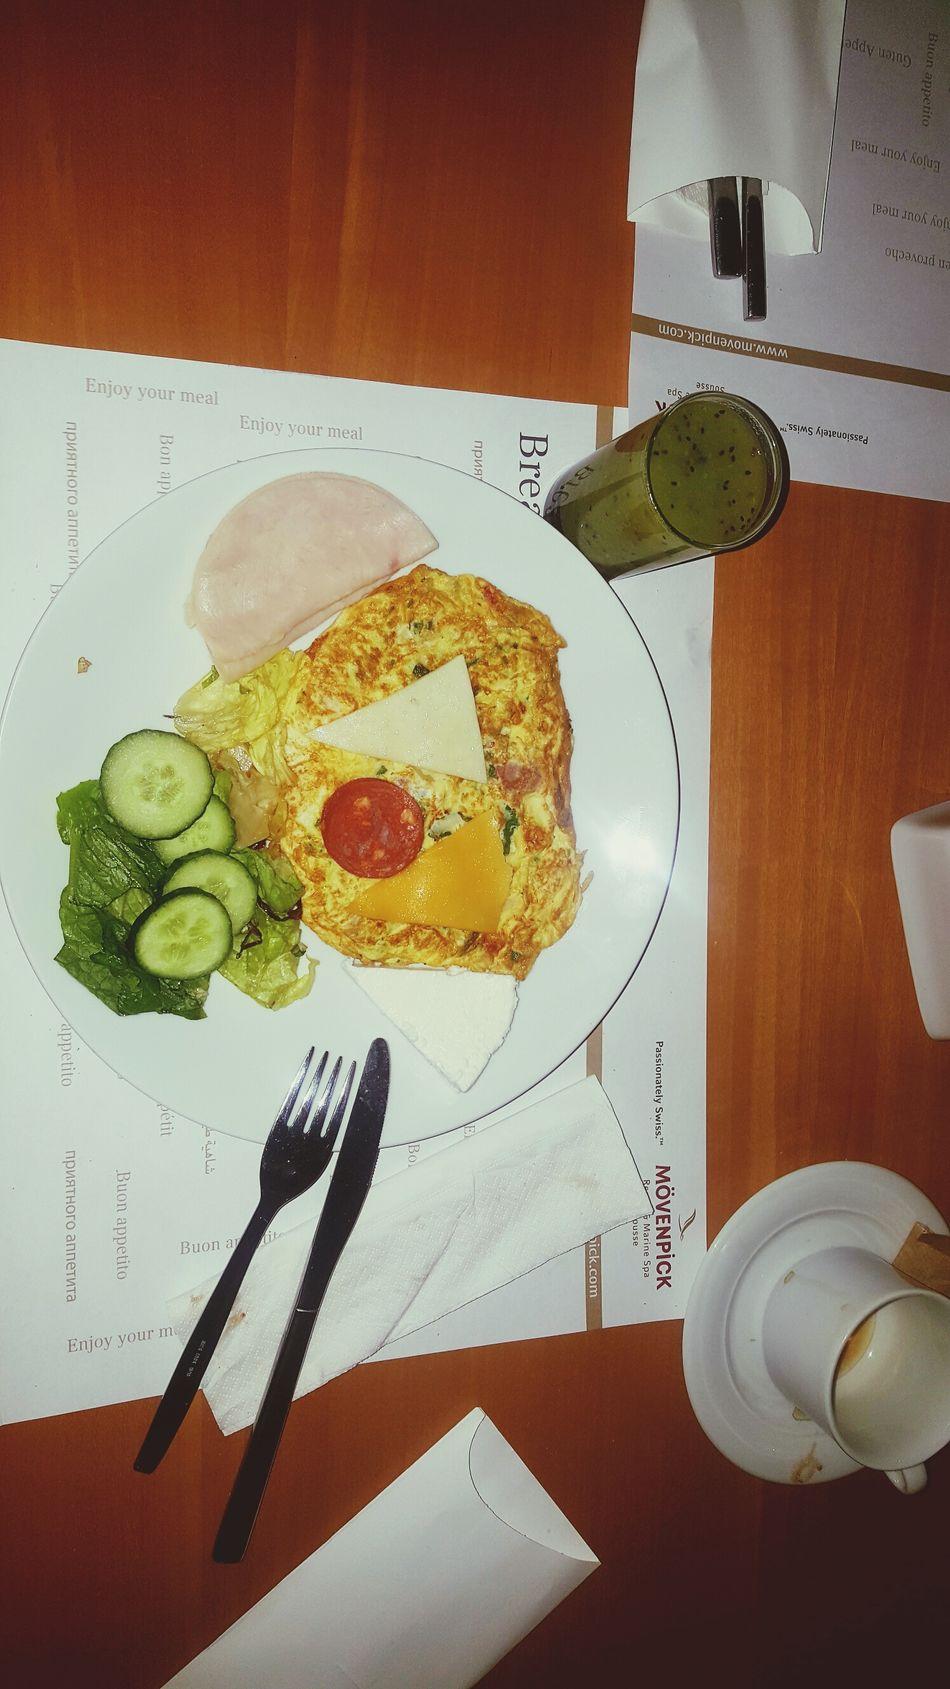 Food No People Indoors  Foodphotography EyeEm Gallery Eye Em Best Shots Breakfast Omlette Omlet Mövenpick Mövenpick Hotel Movenpick_hotel